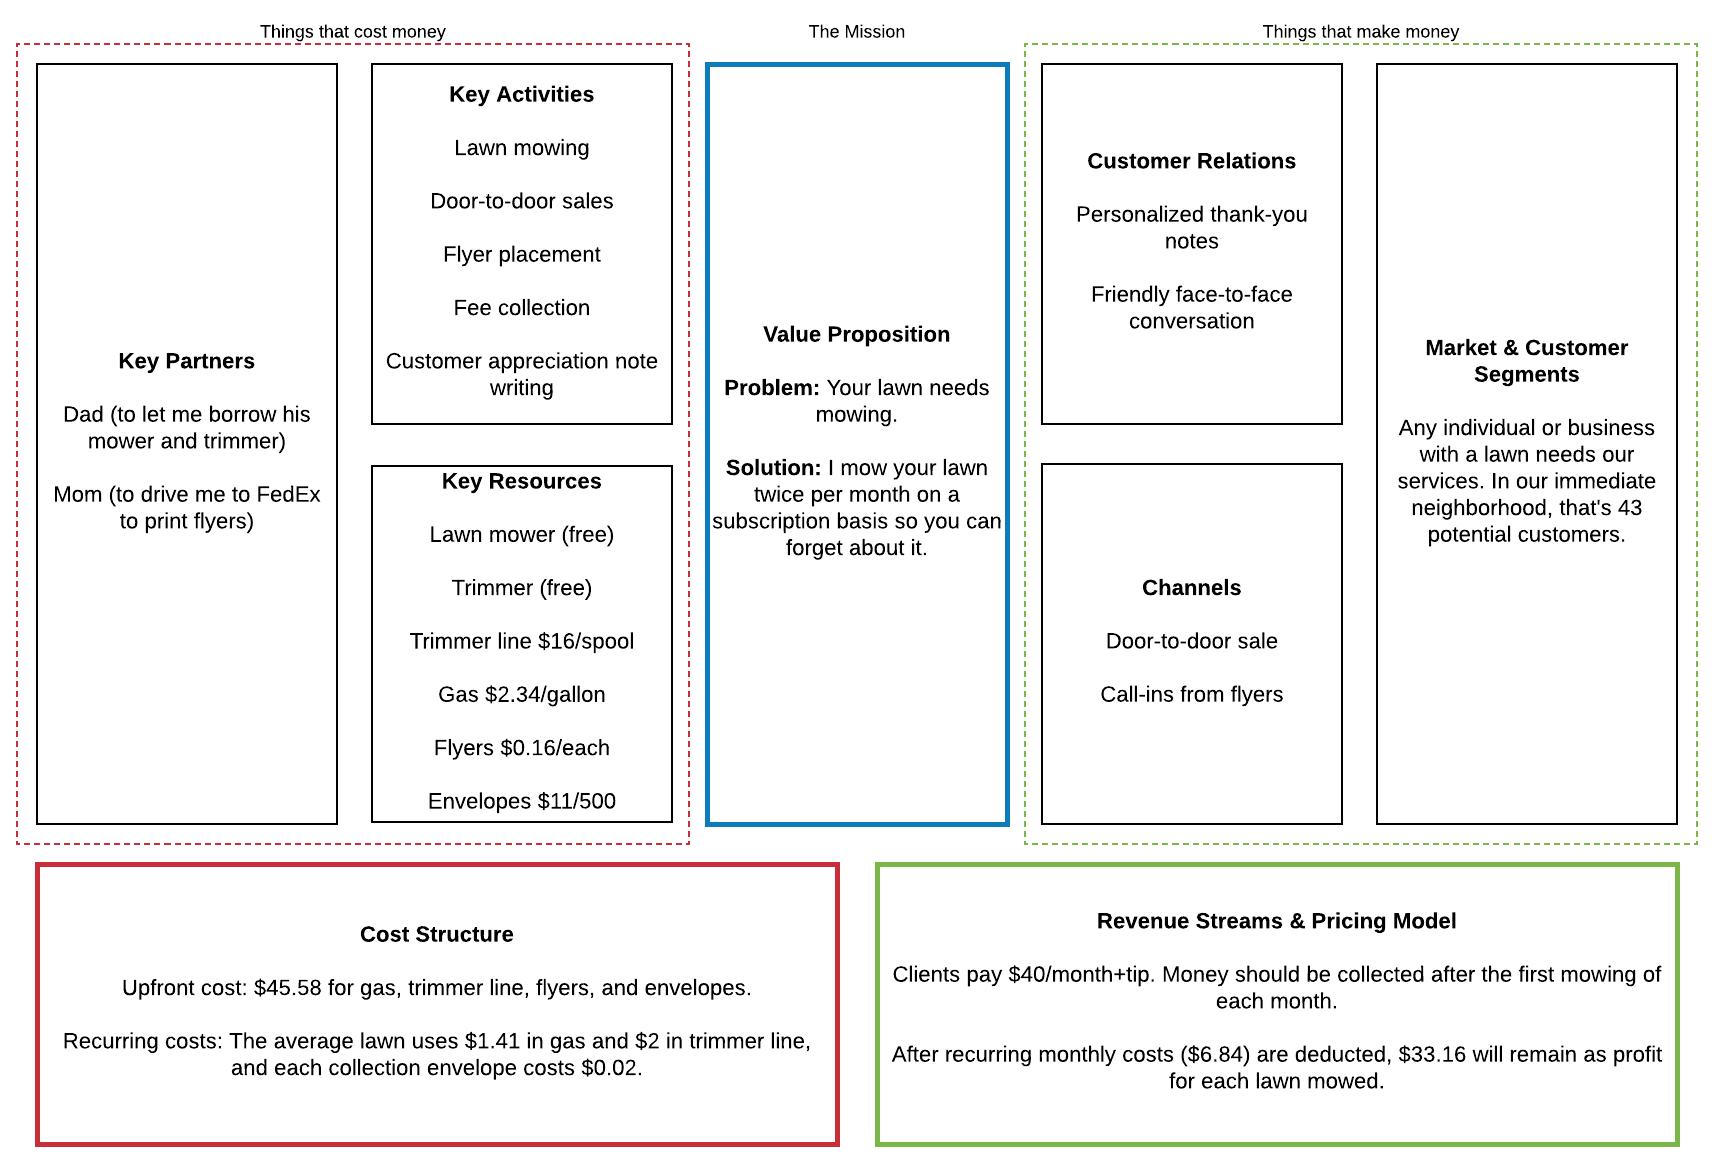 How To Make A Lean Canvas Model Lucidchart Blog